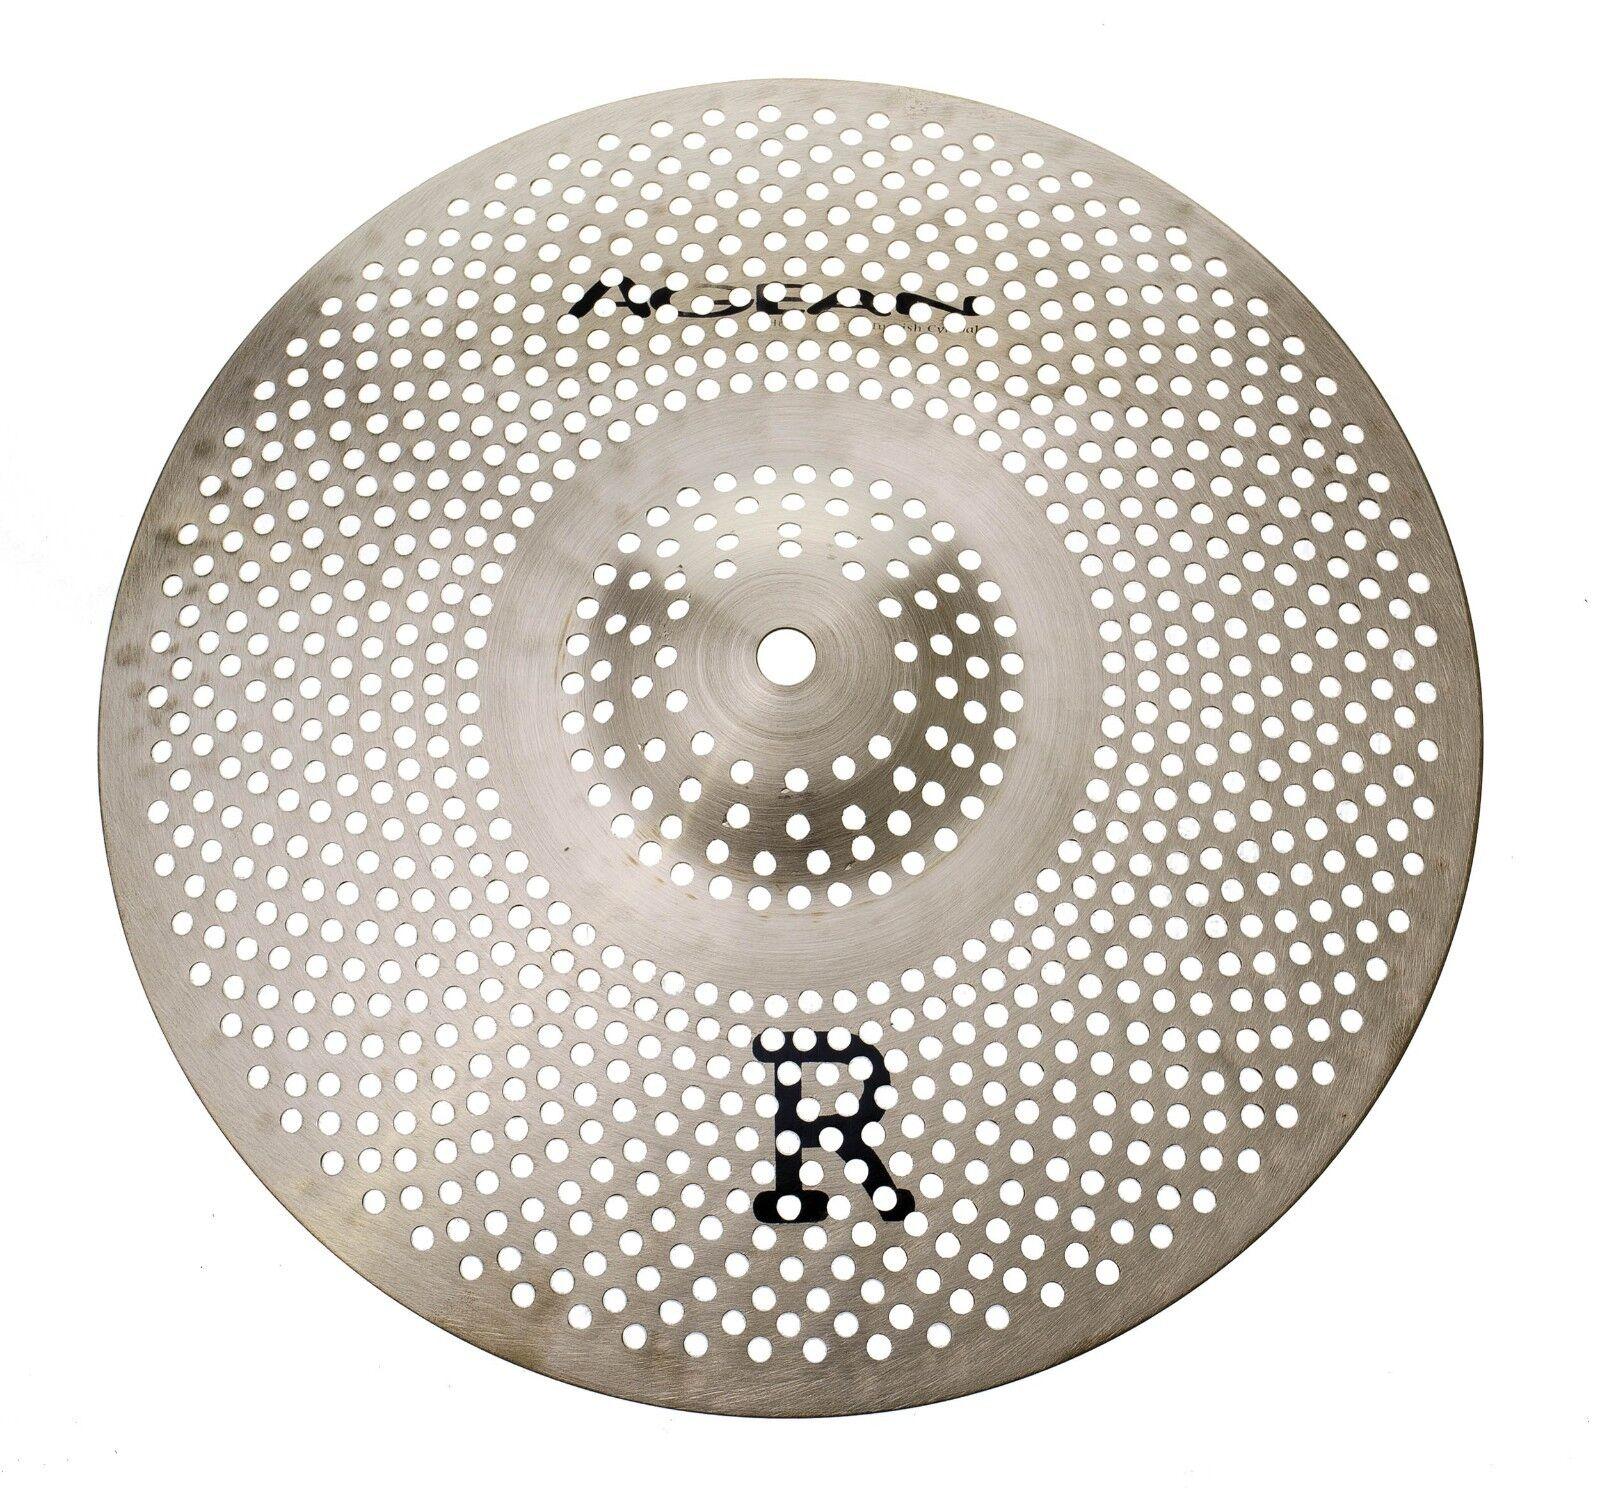 Agean Cymbals R Series 18-inch Low Volume Crash  R-CRS18